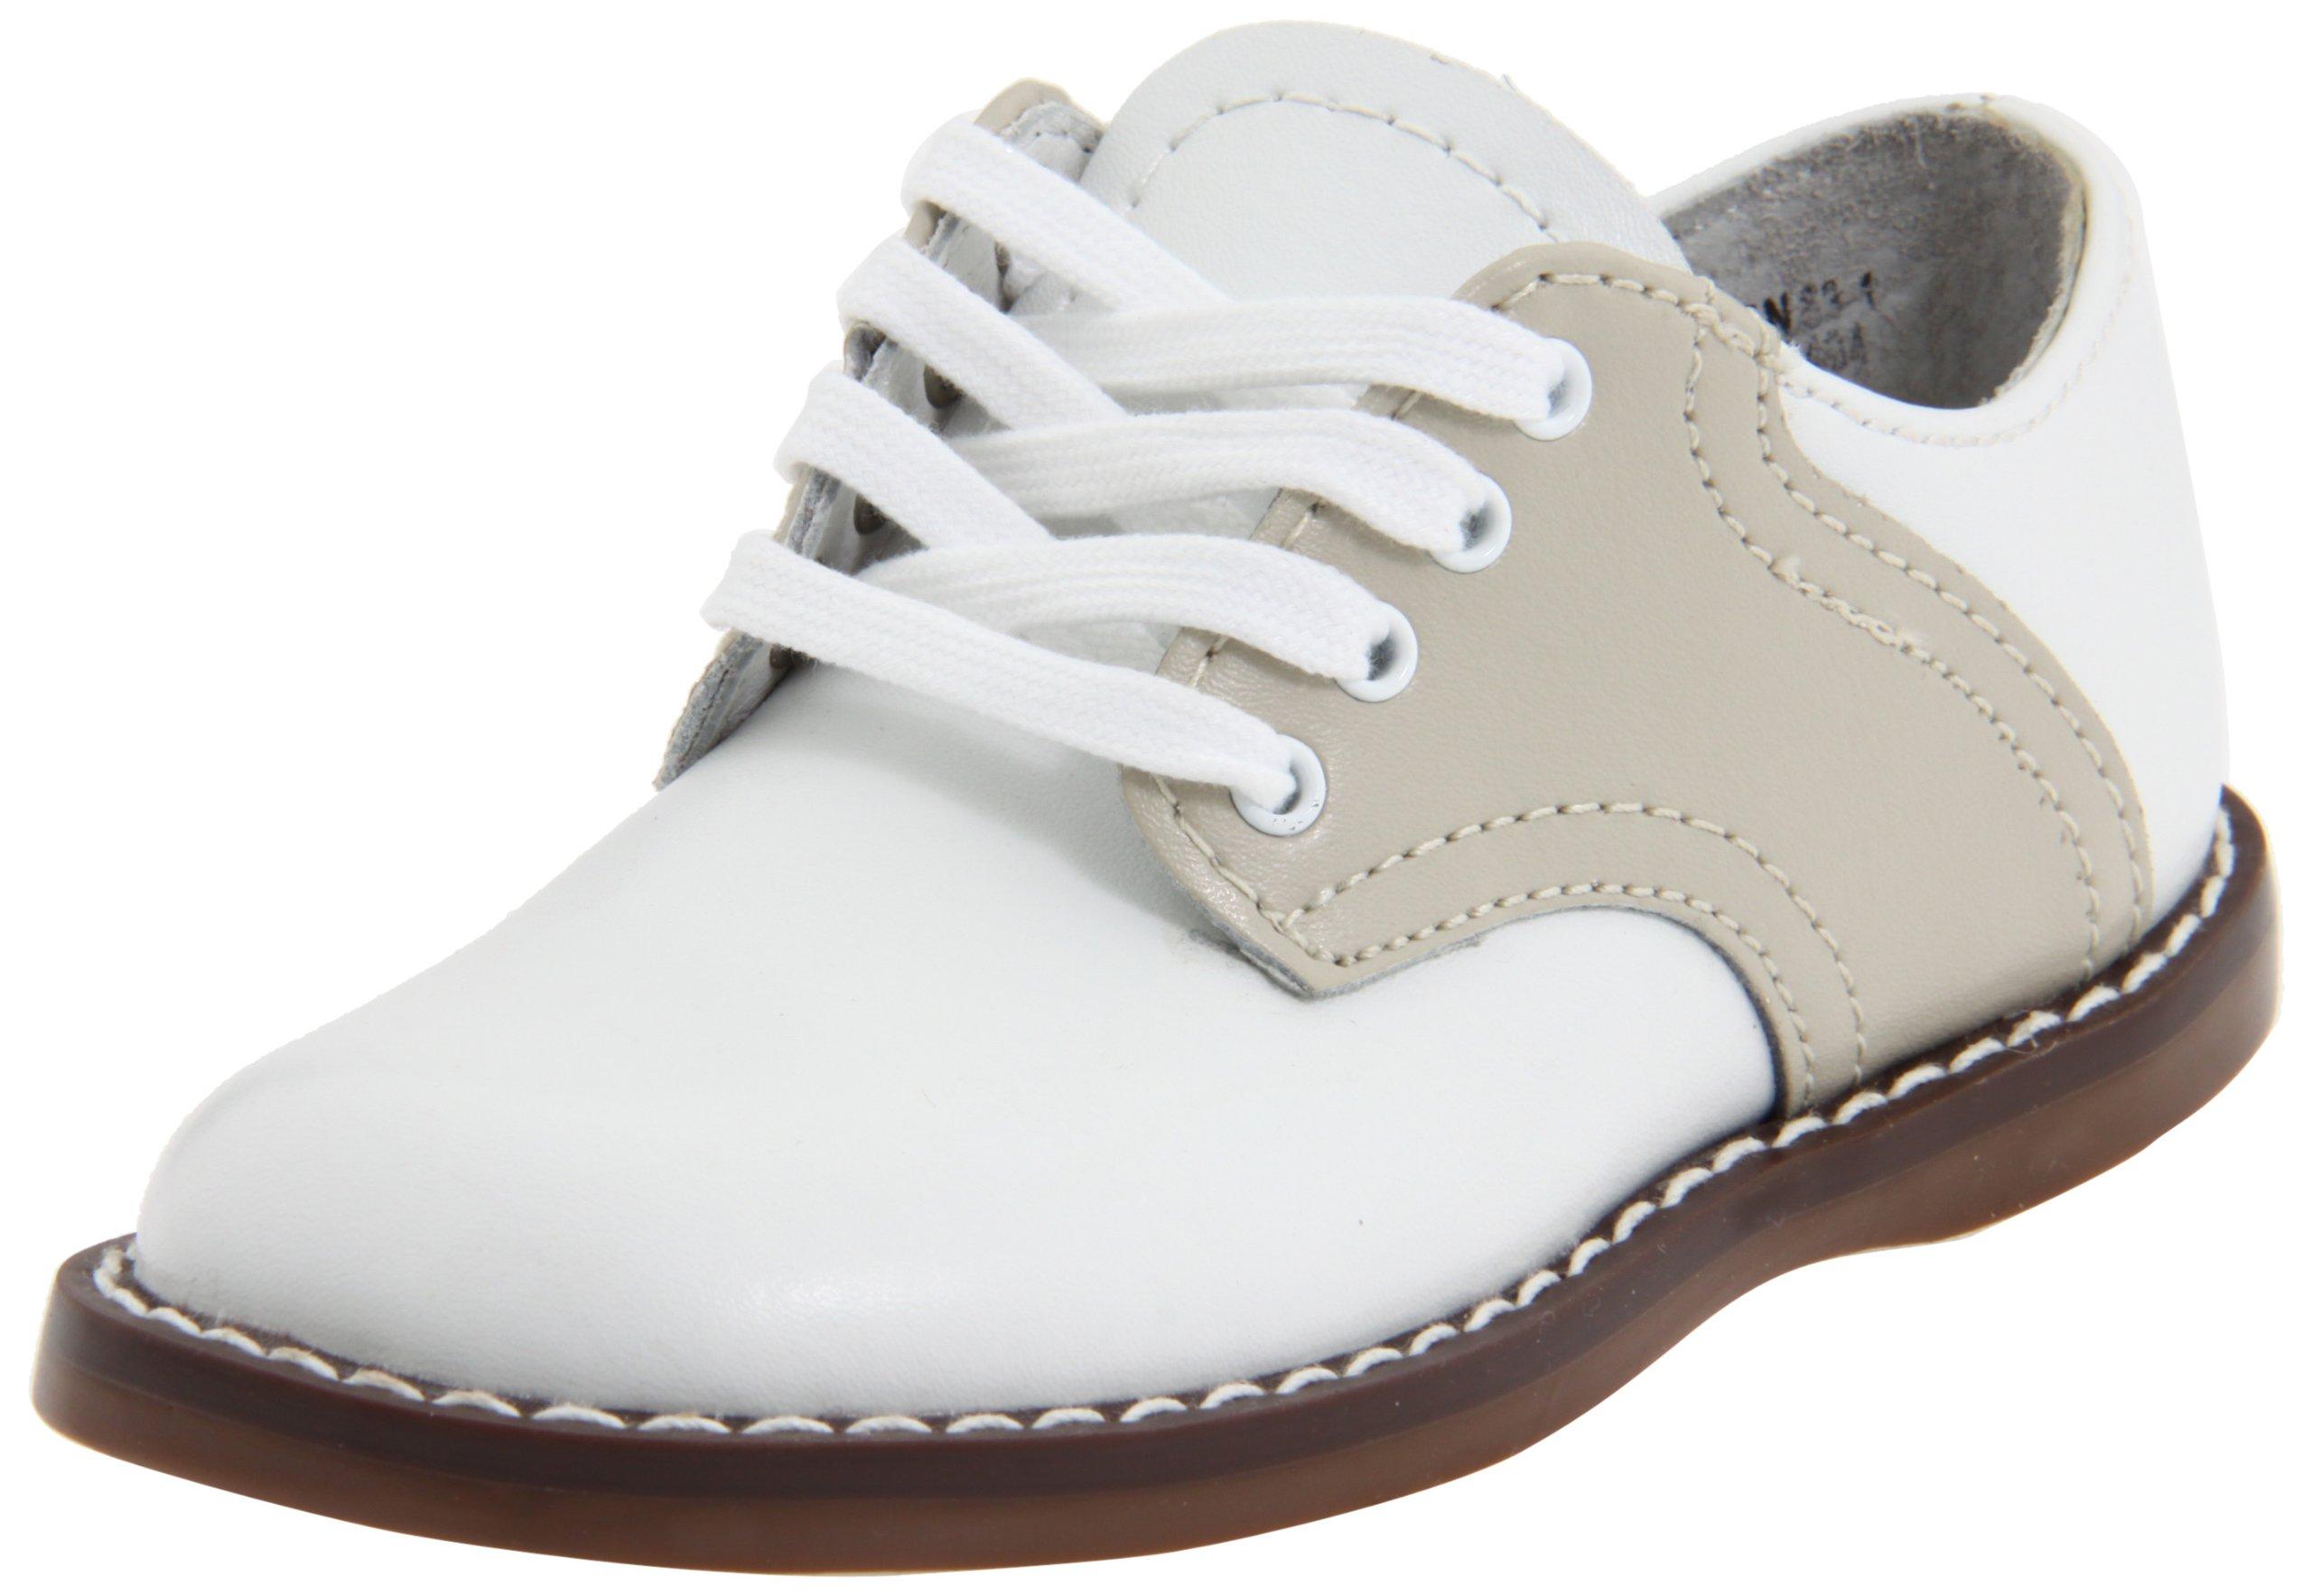 FootMates Cheer 2 Oxford (Infant/Toddler),White/Ecru,6 M US Toddler